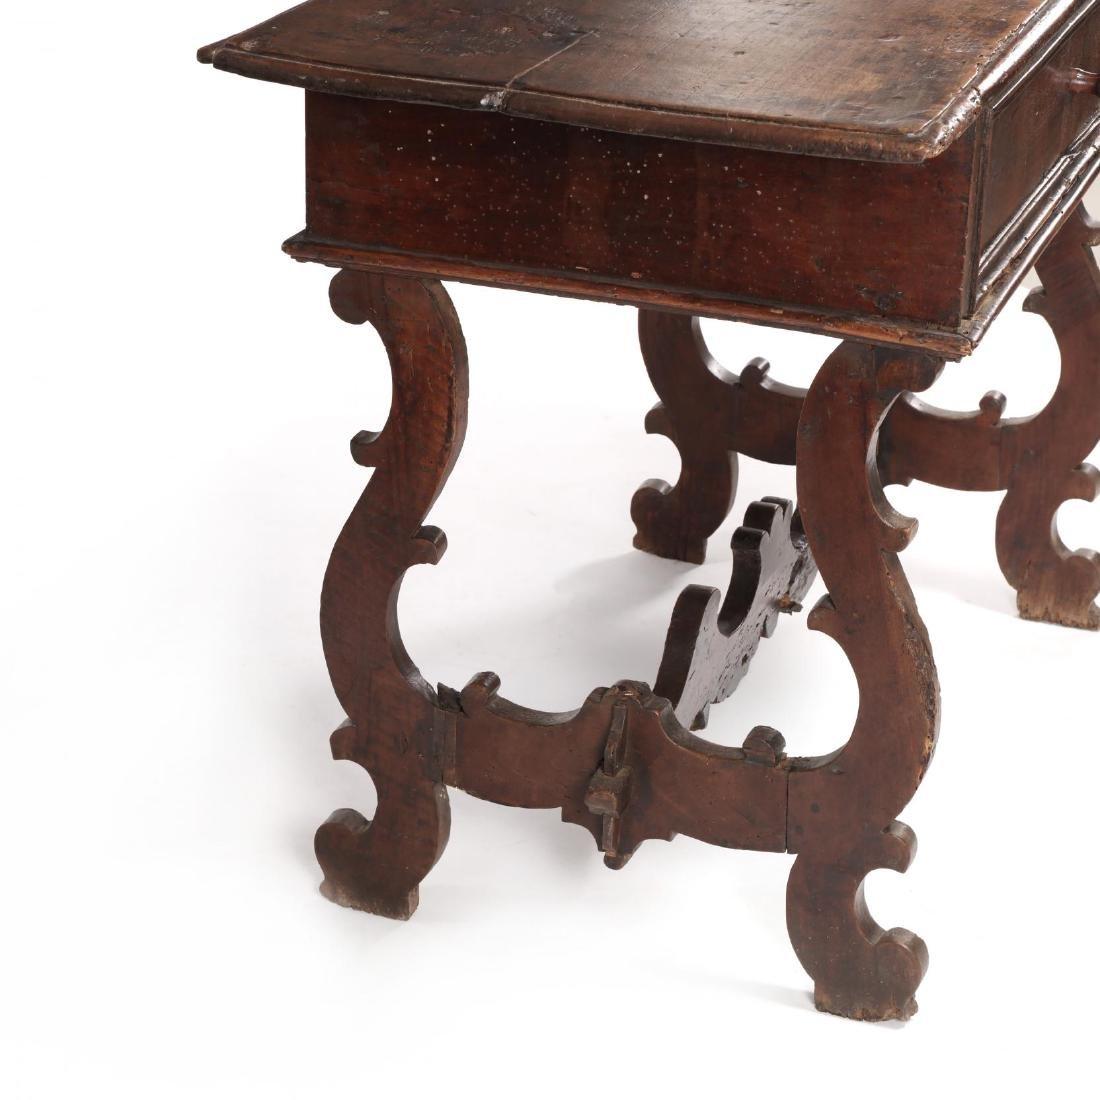 Spanish Baroque Walnut Serving Table - 3